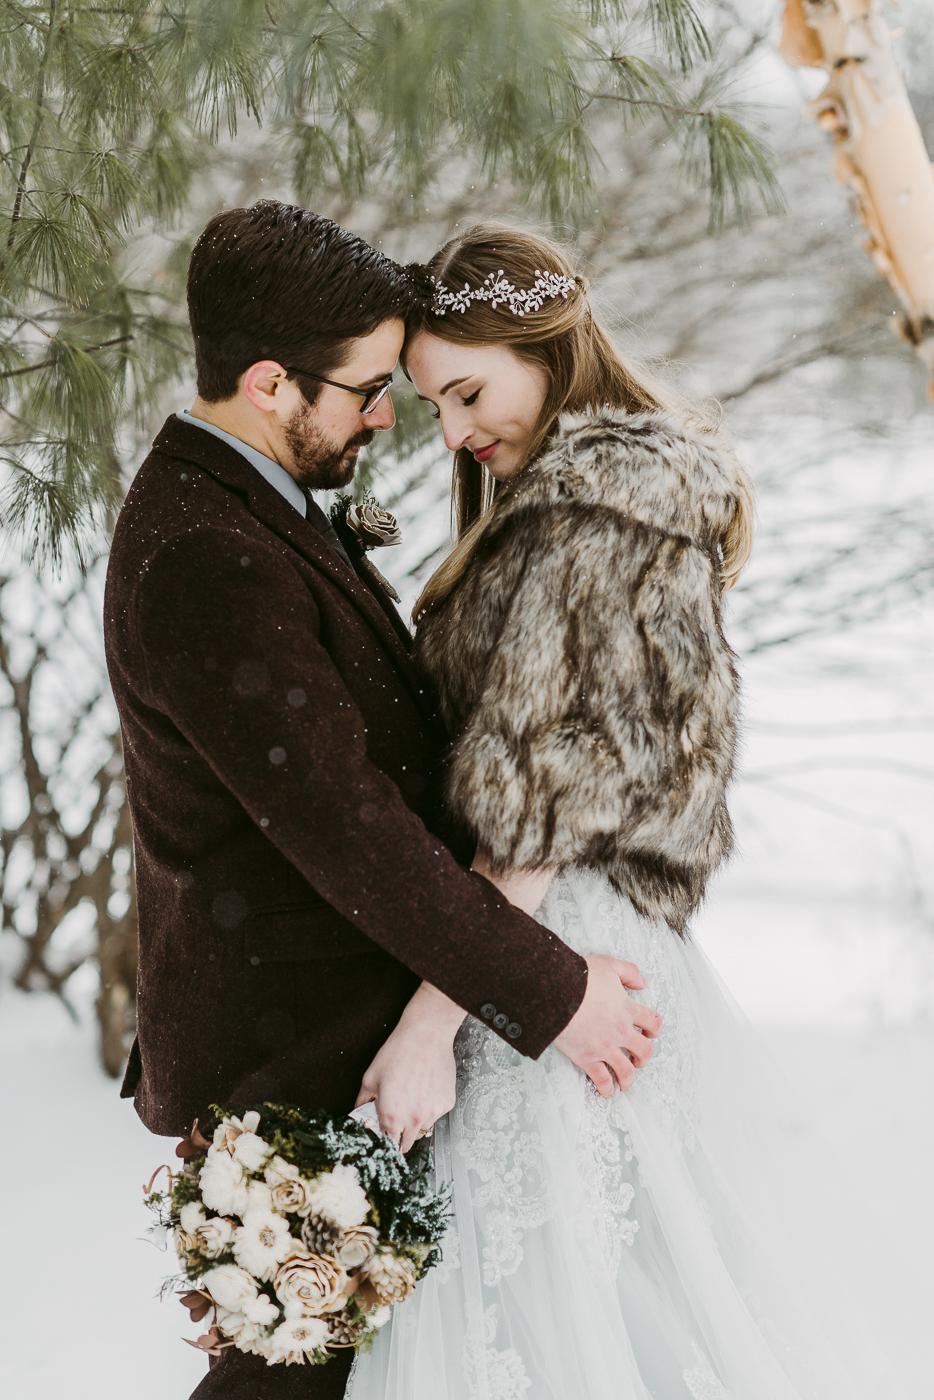 Squires-Castle-Winter-Wedding-9.jpg